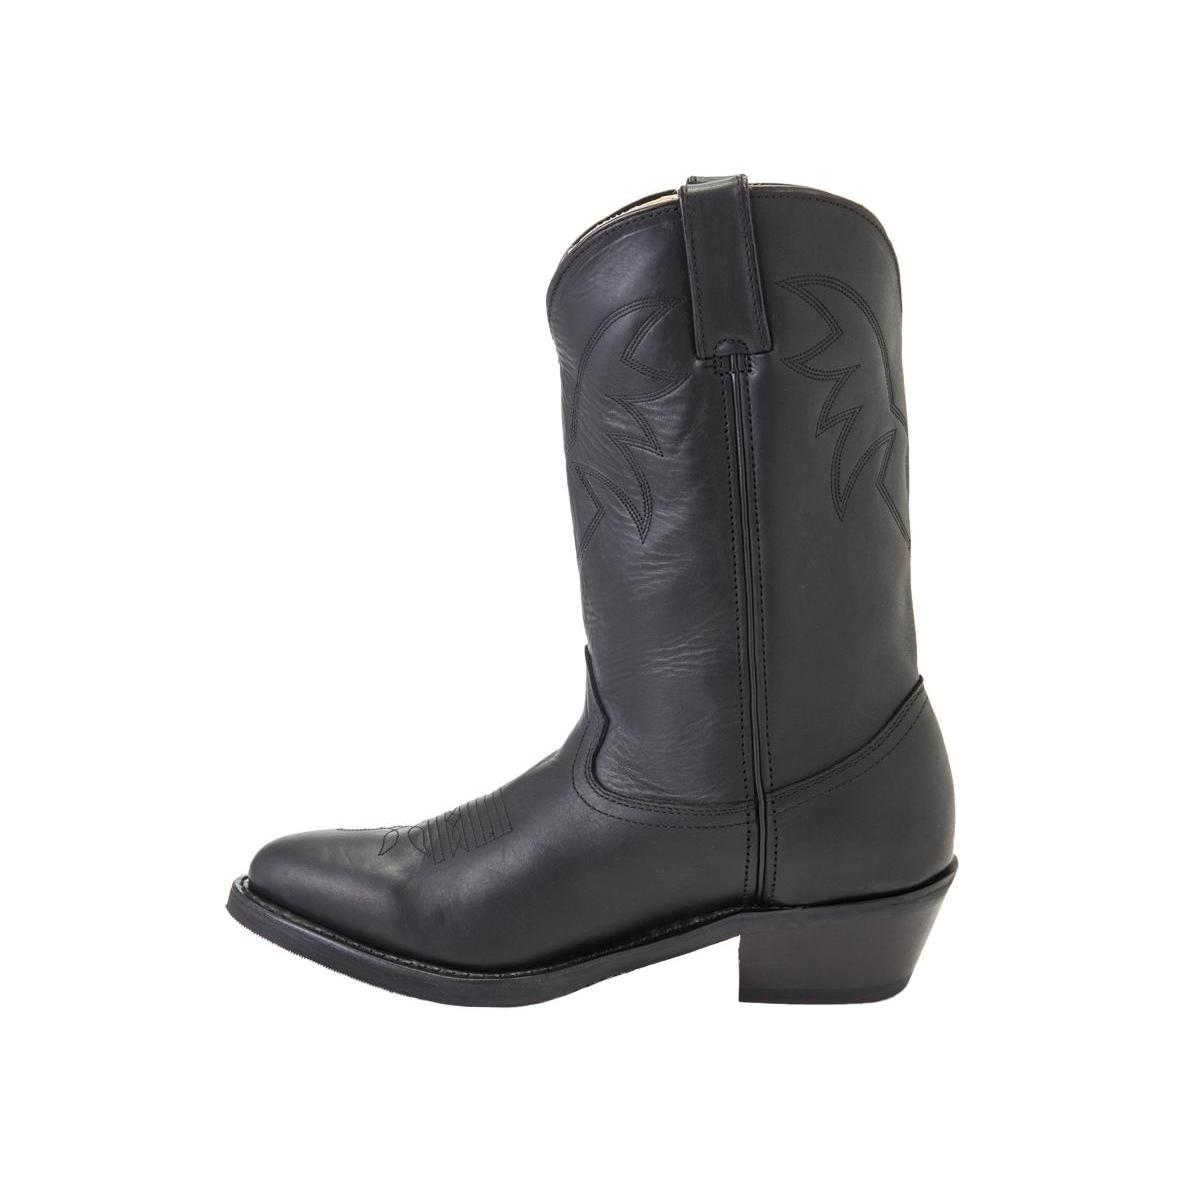 Durango: Men's Oiled Black Leather Comfort Western Boots